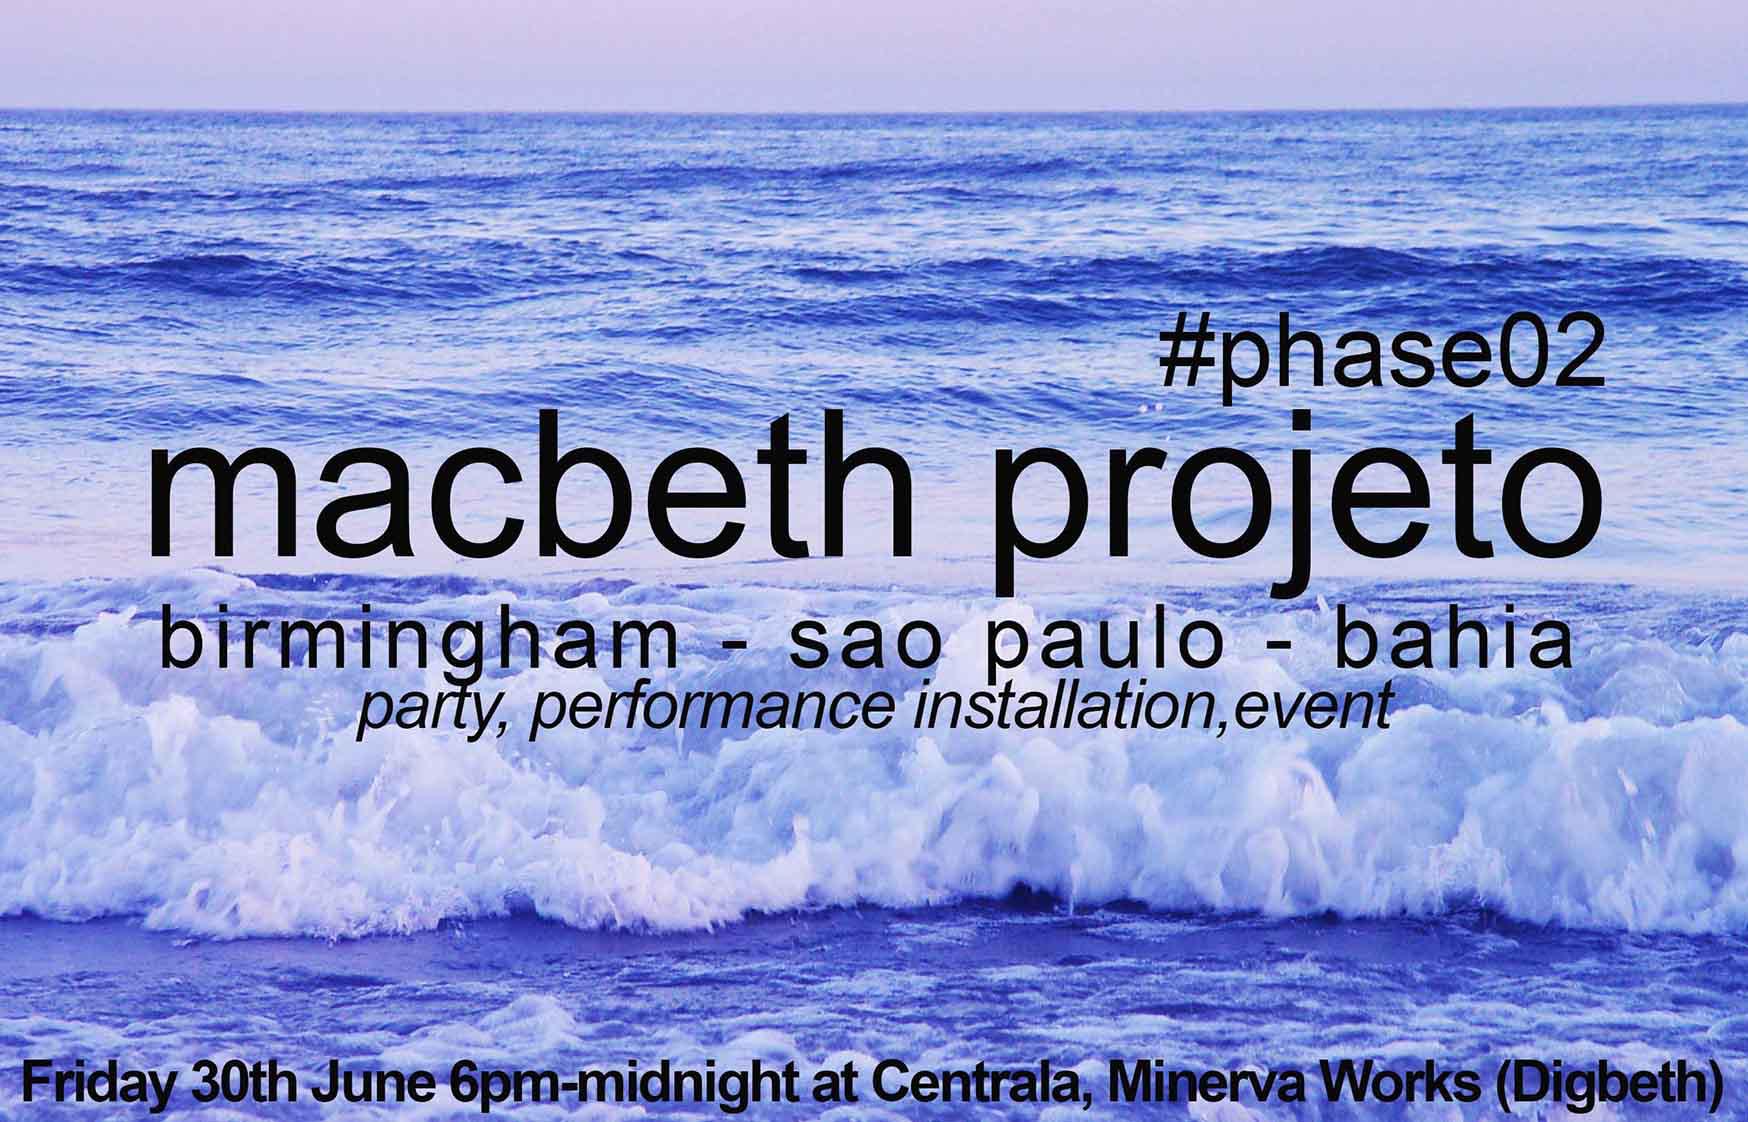 Macbeth Projeto